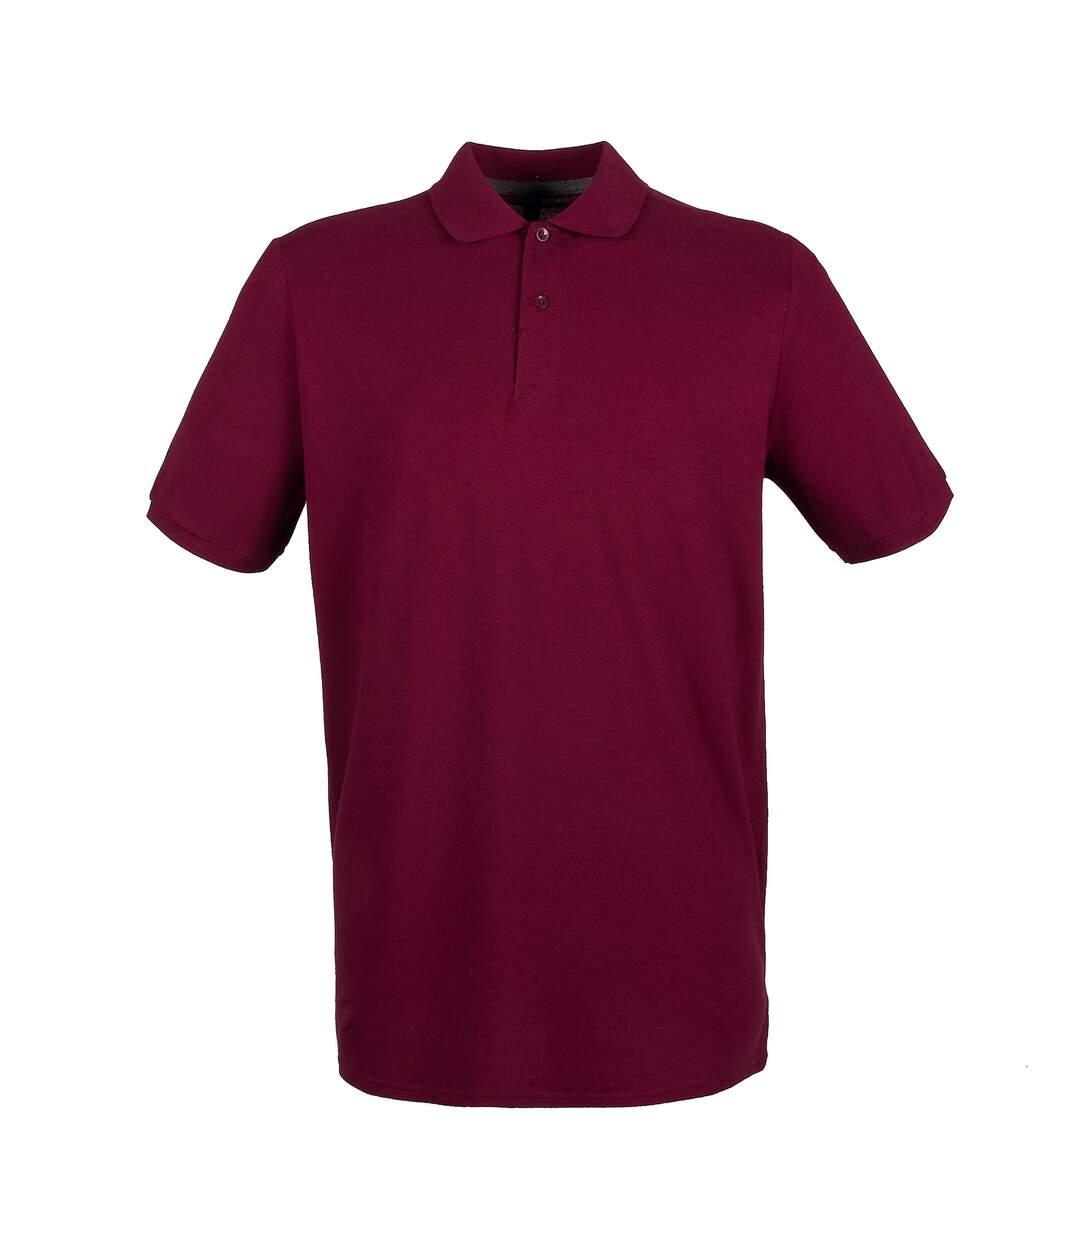 Henbury Mens Modern Fit Cotton Pique Polo Shirt (Burgundy) - UTPC2590